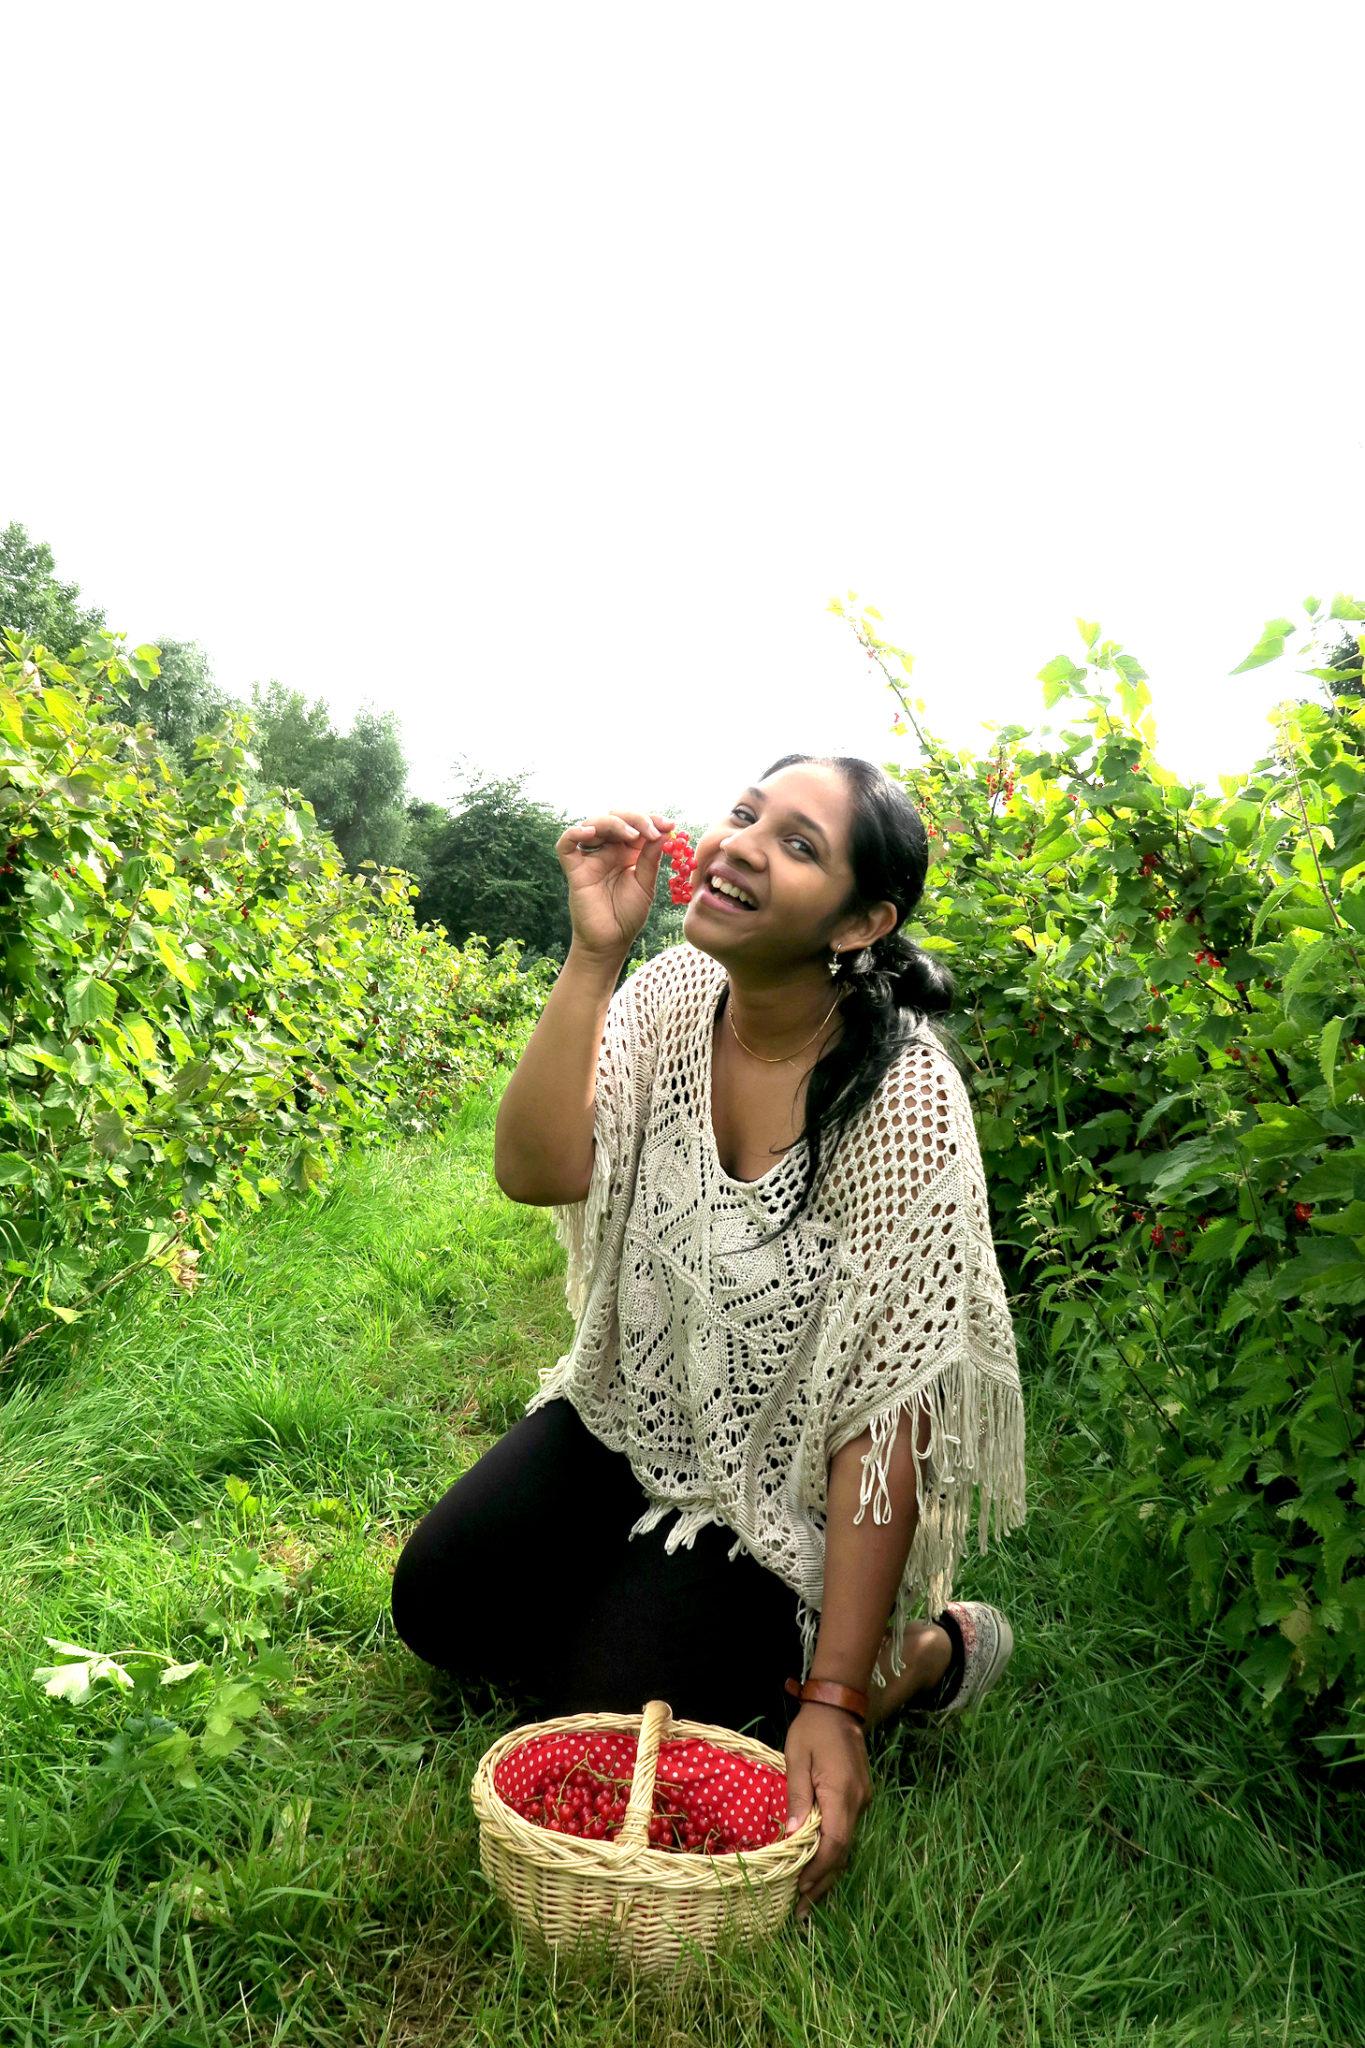 Hema_pose_ses_valises_fermes_de_gally_cueillette_groseille_fruits_gourmandise